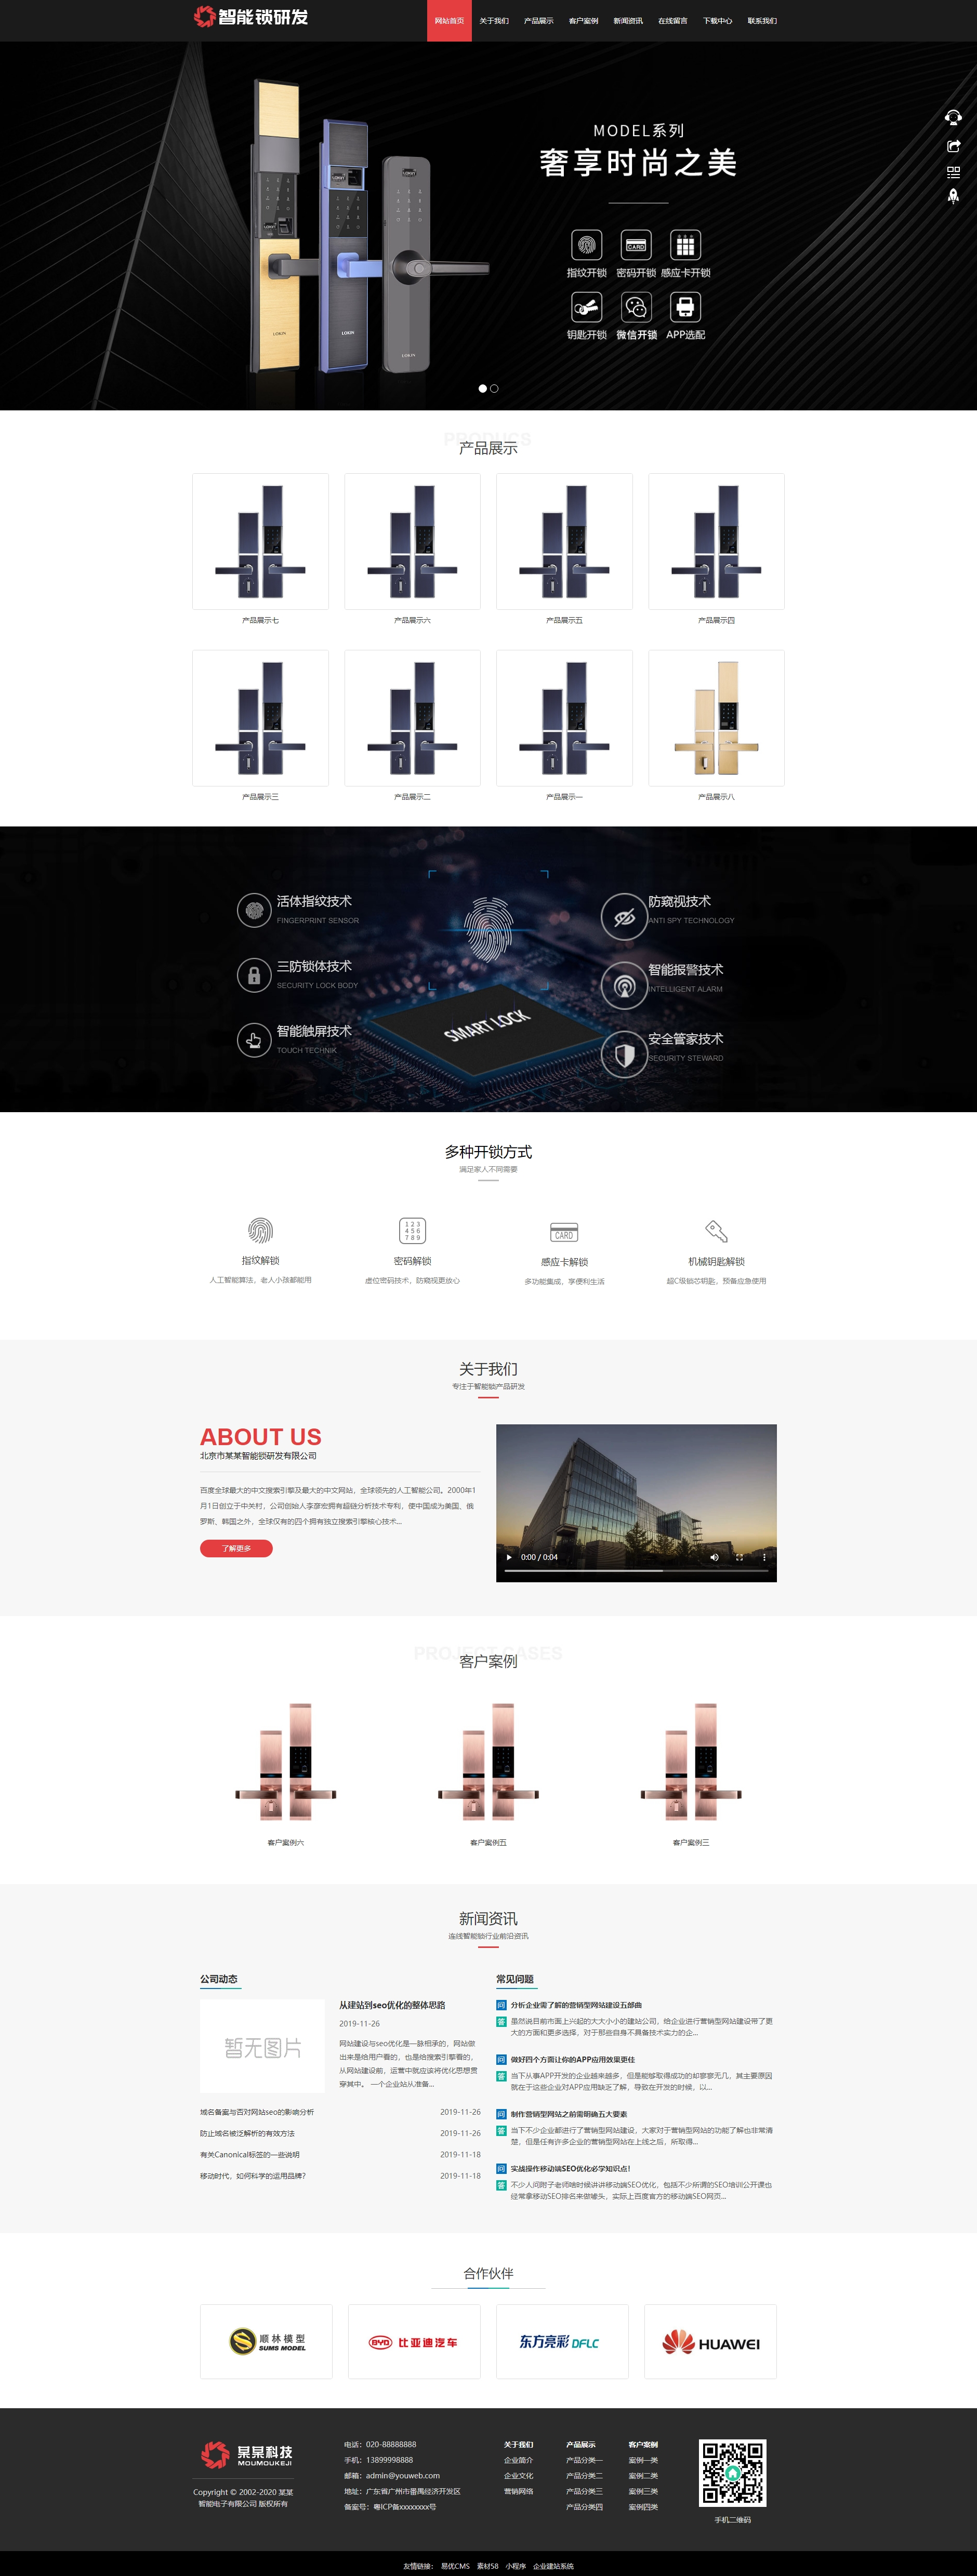 HTML5智能锁具电子产品网站筱航科技免费模板